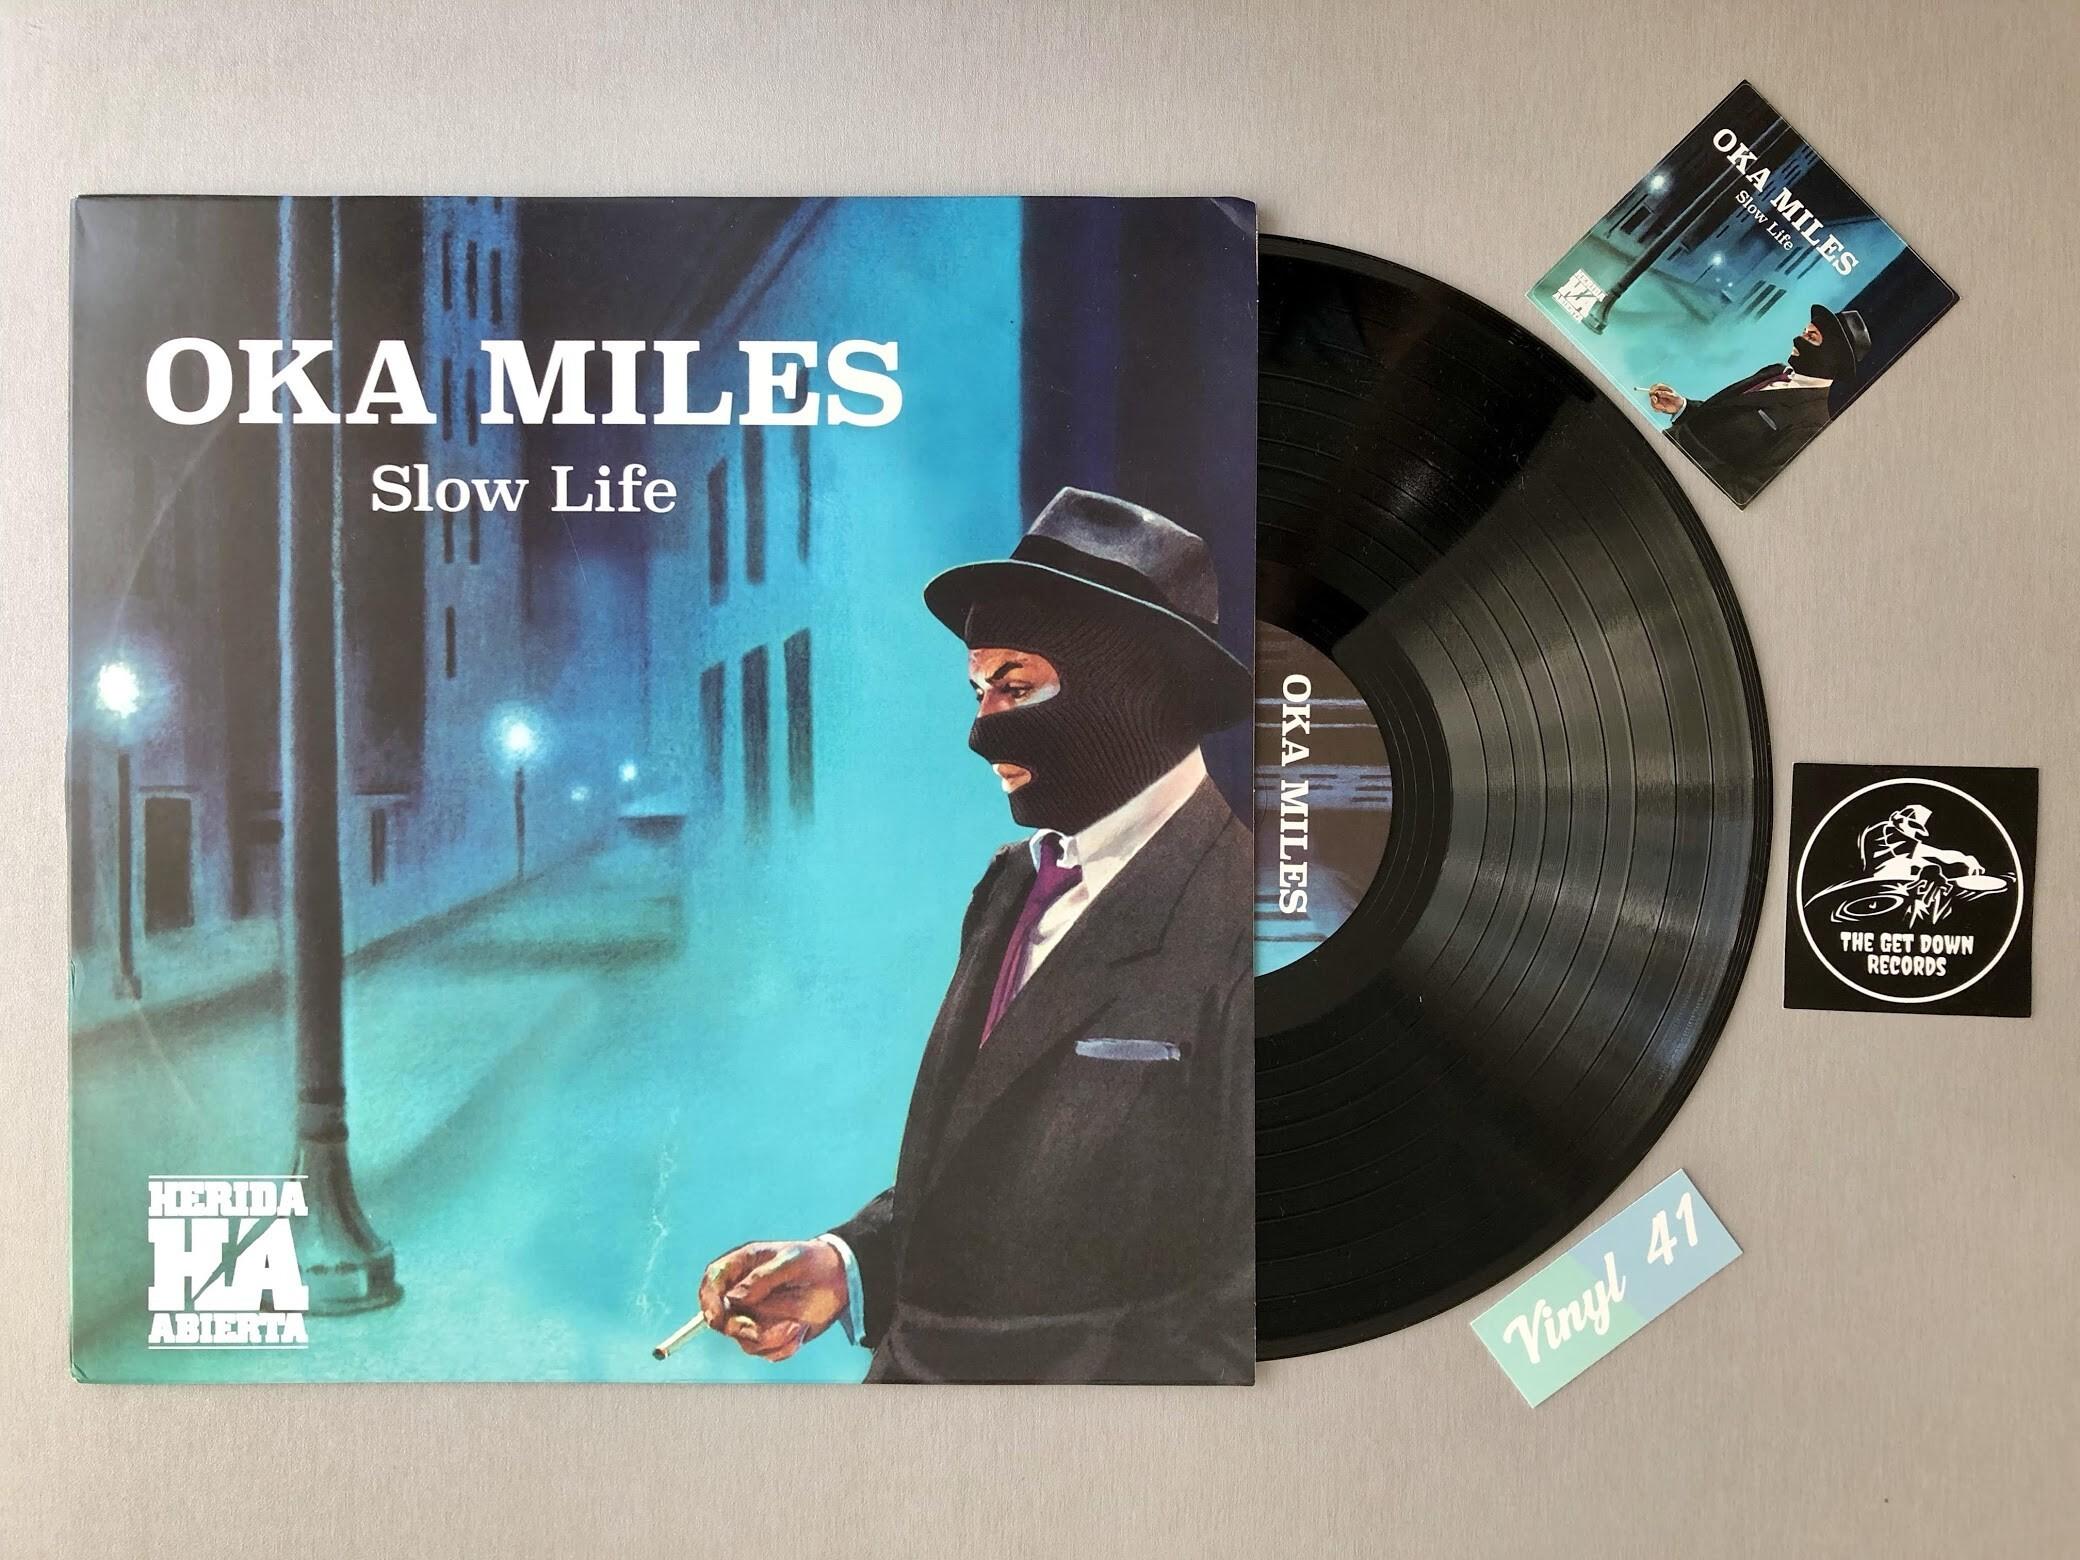 Oka Miles - Slow Life